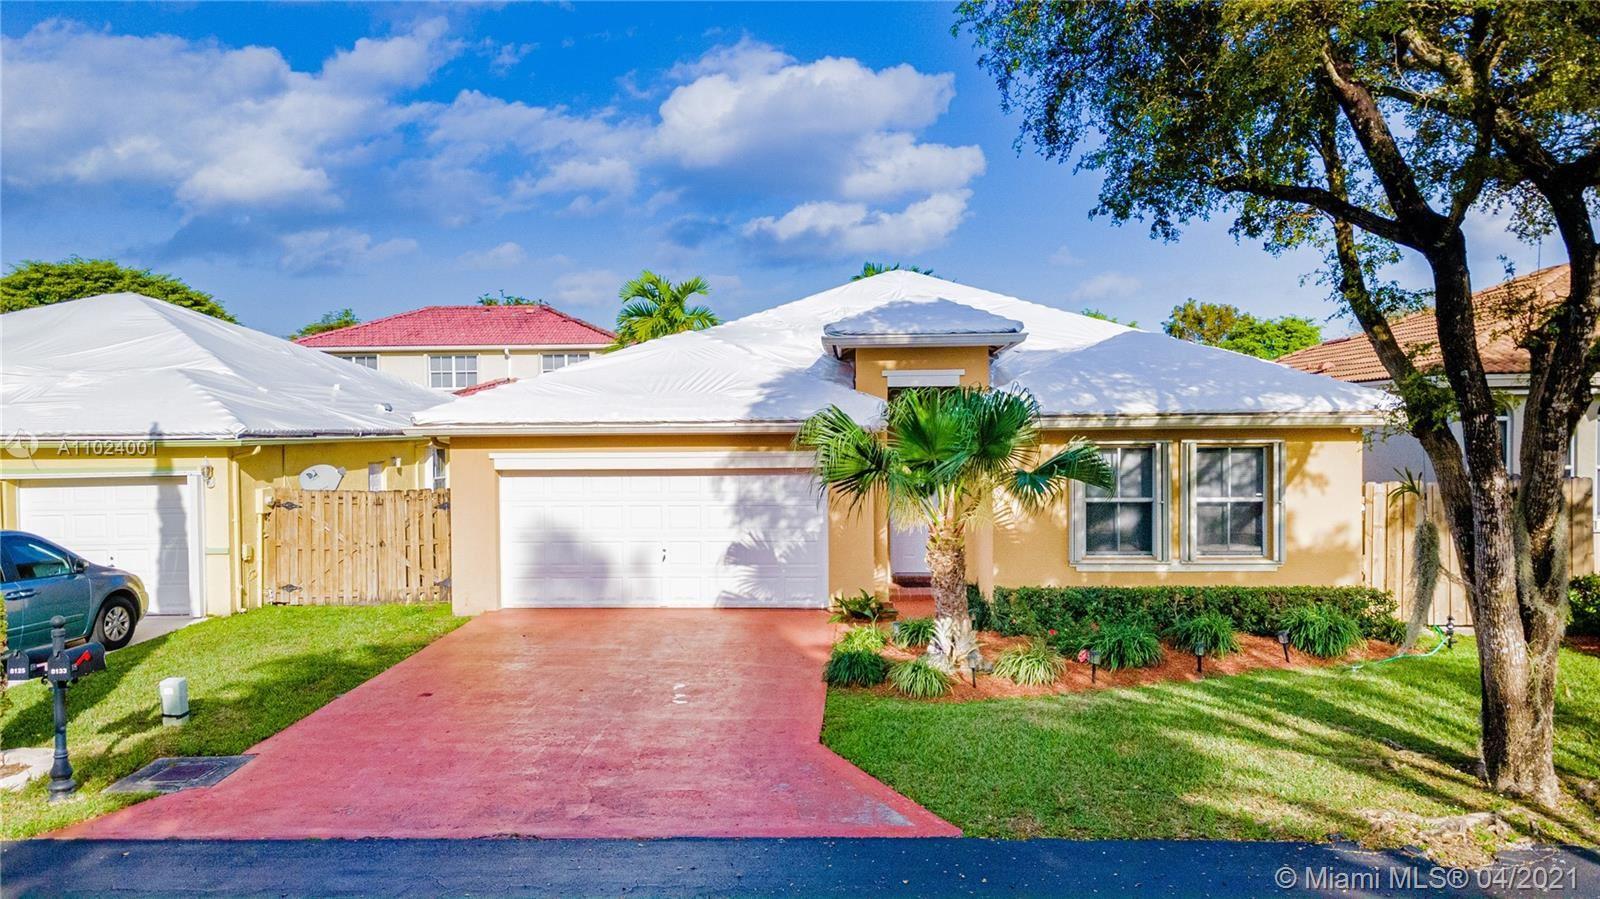 8133 SW 163rd Pl, Miami, FL 33193 - #: A11024001